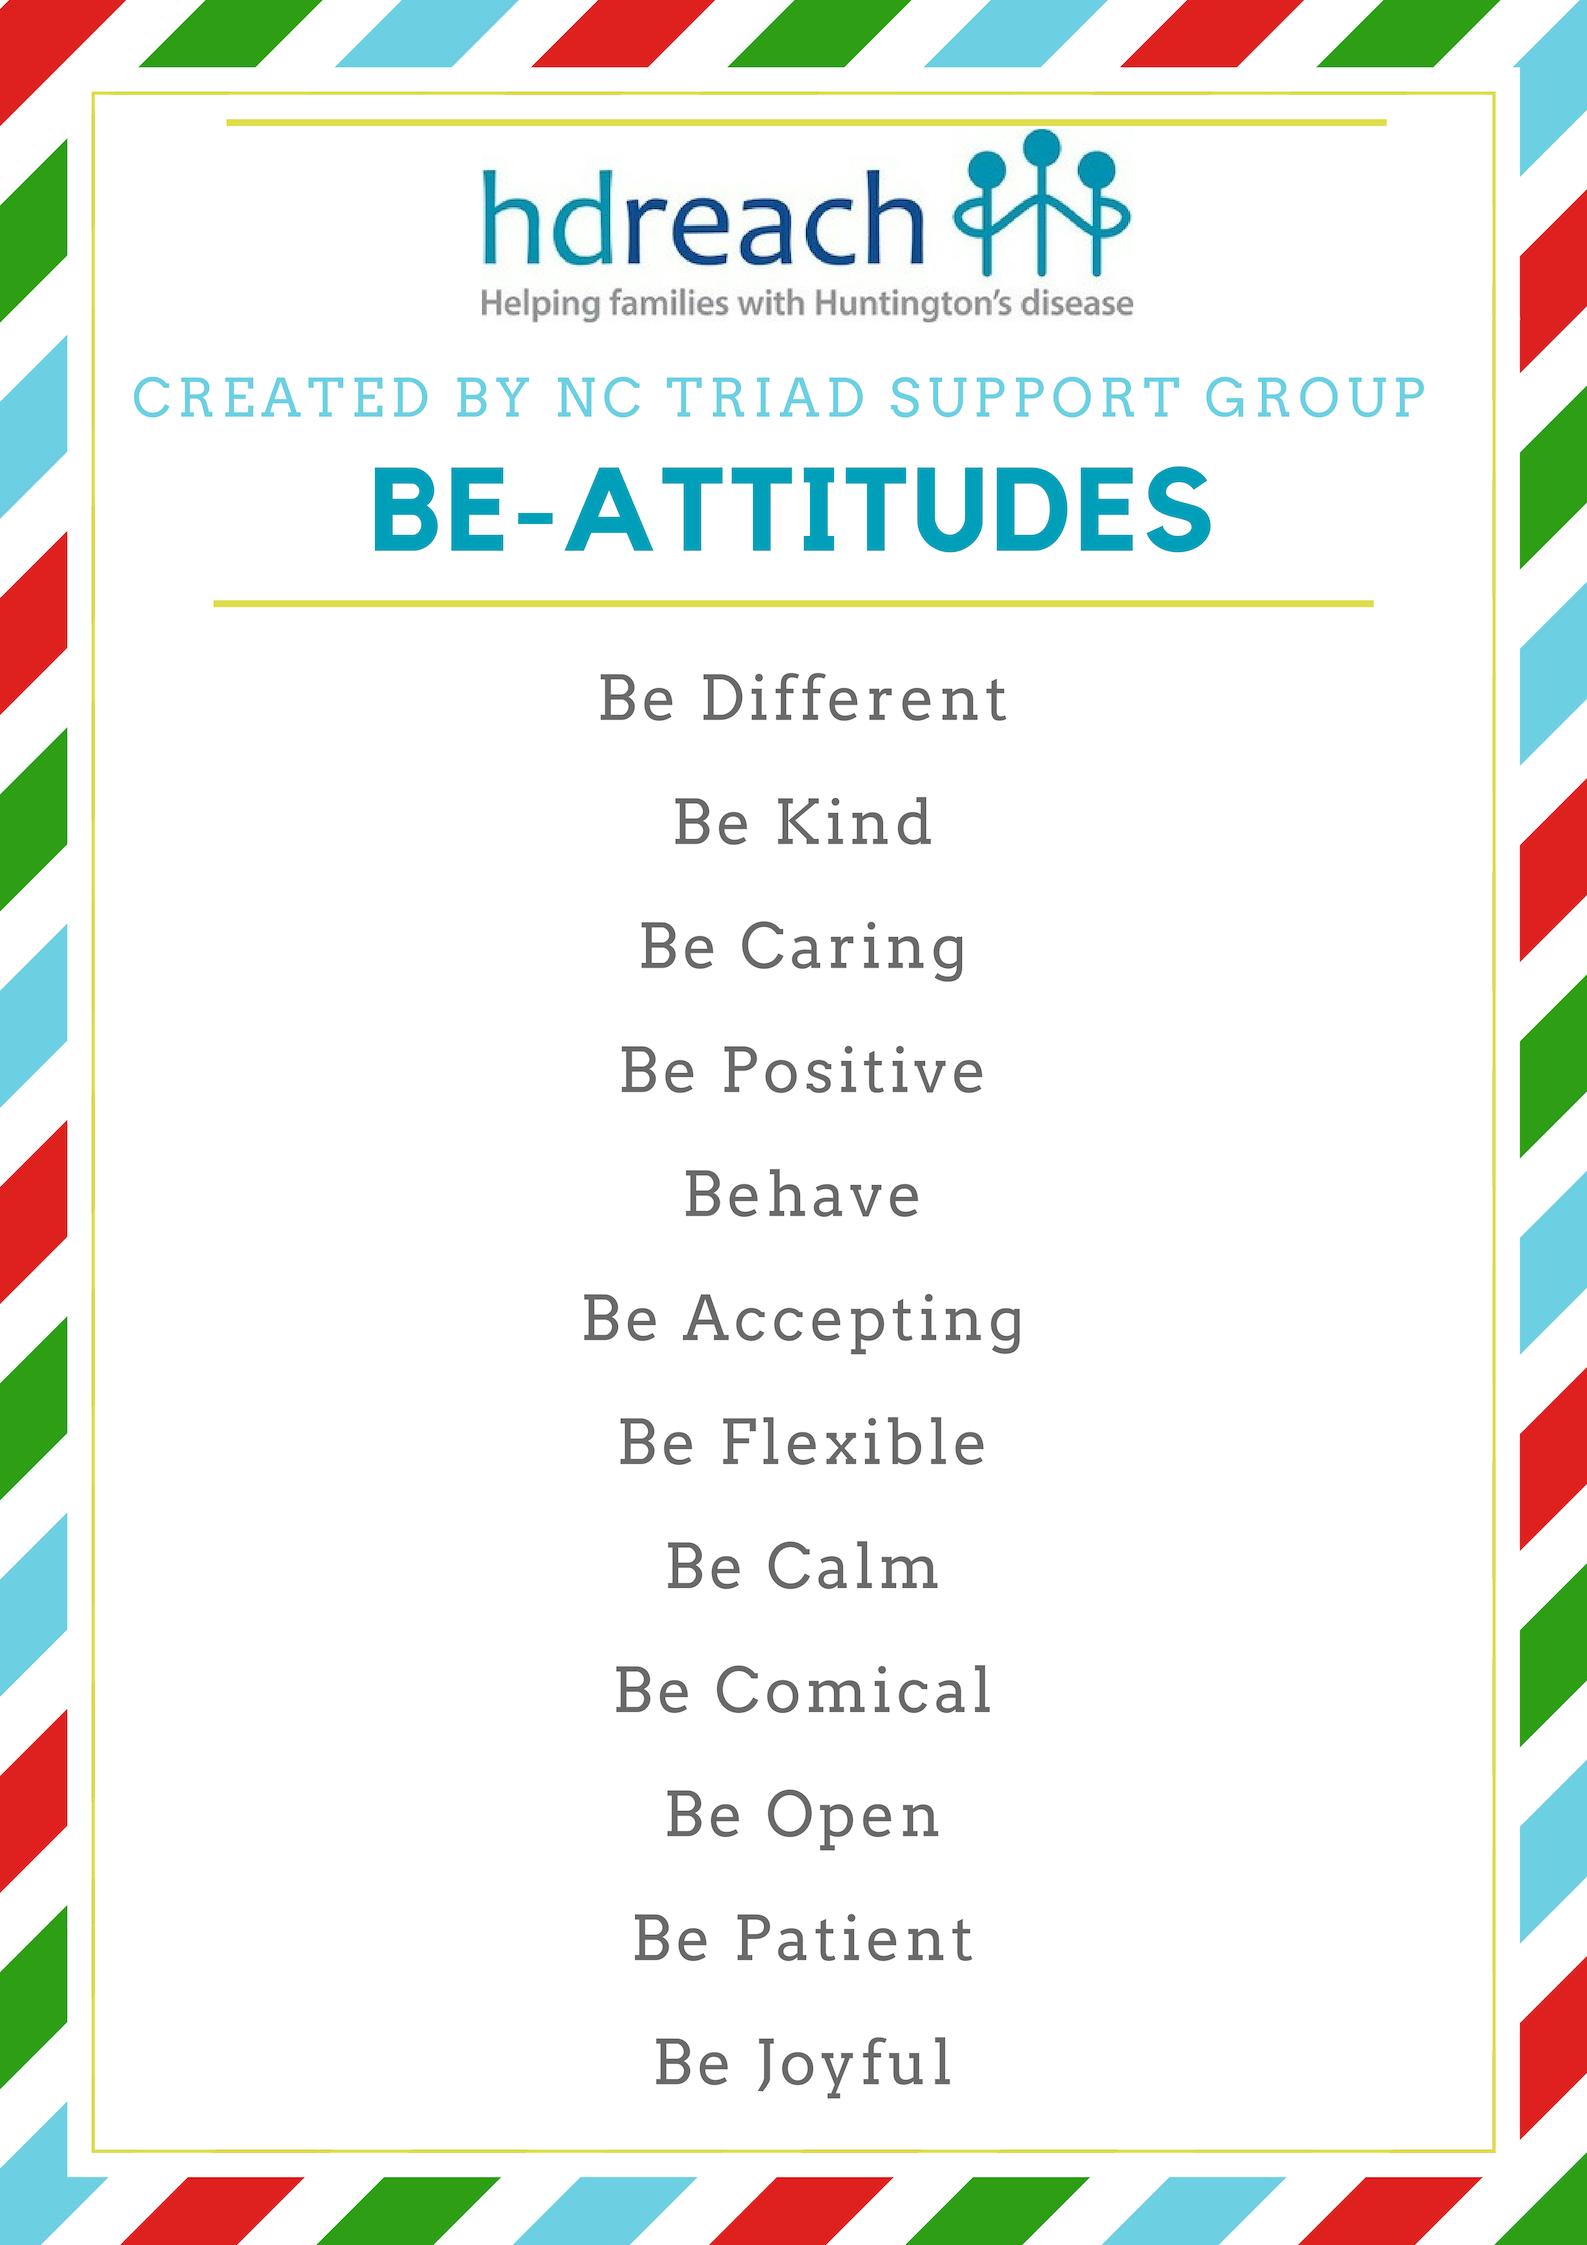 Triad Support Group Creates Be-Attitudes